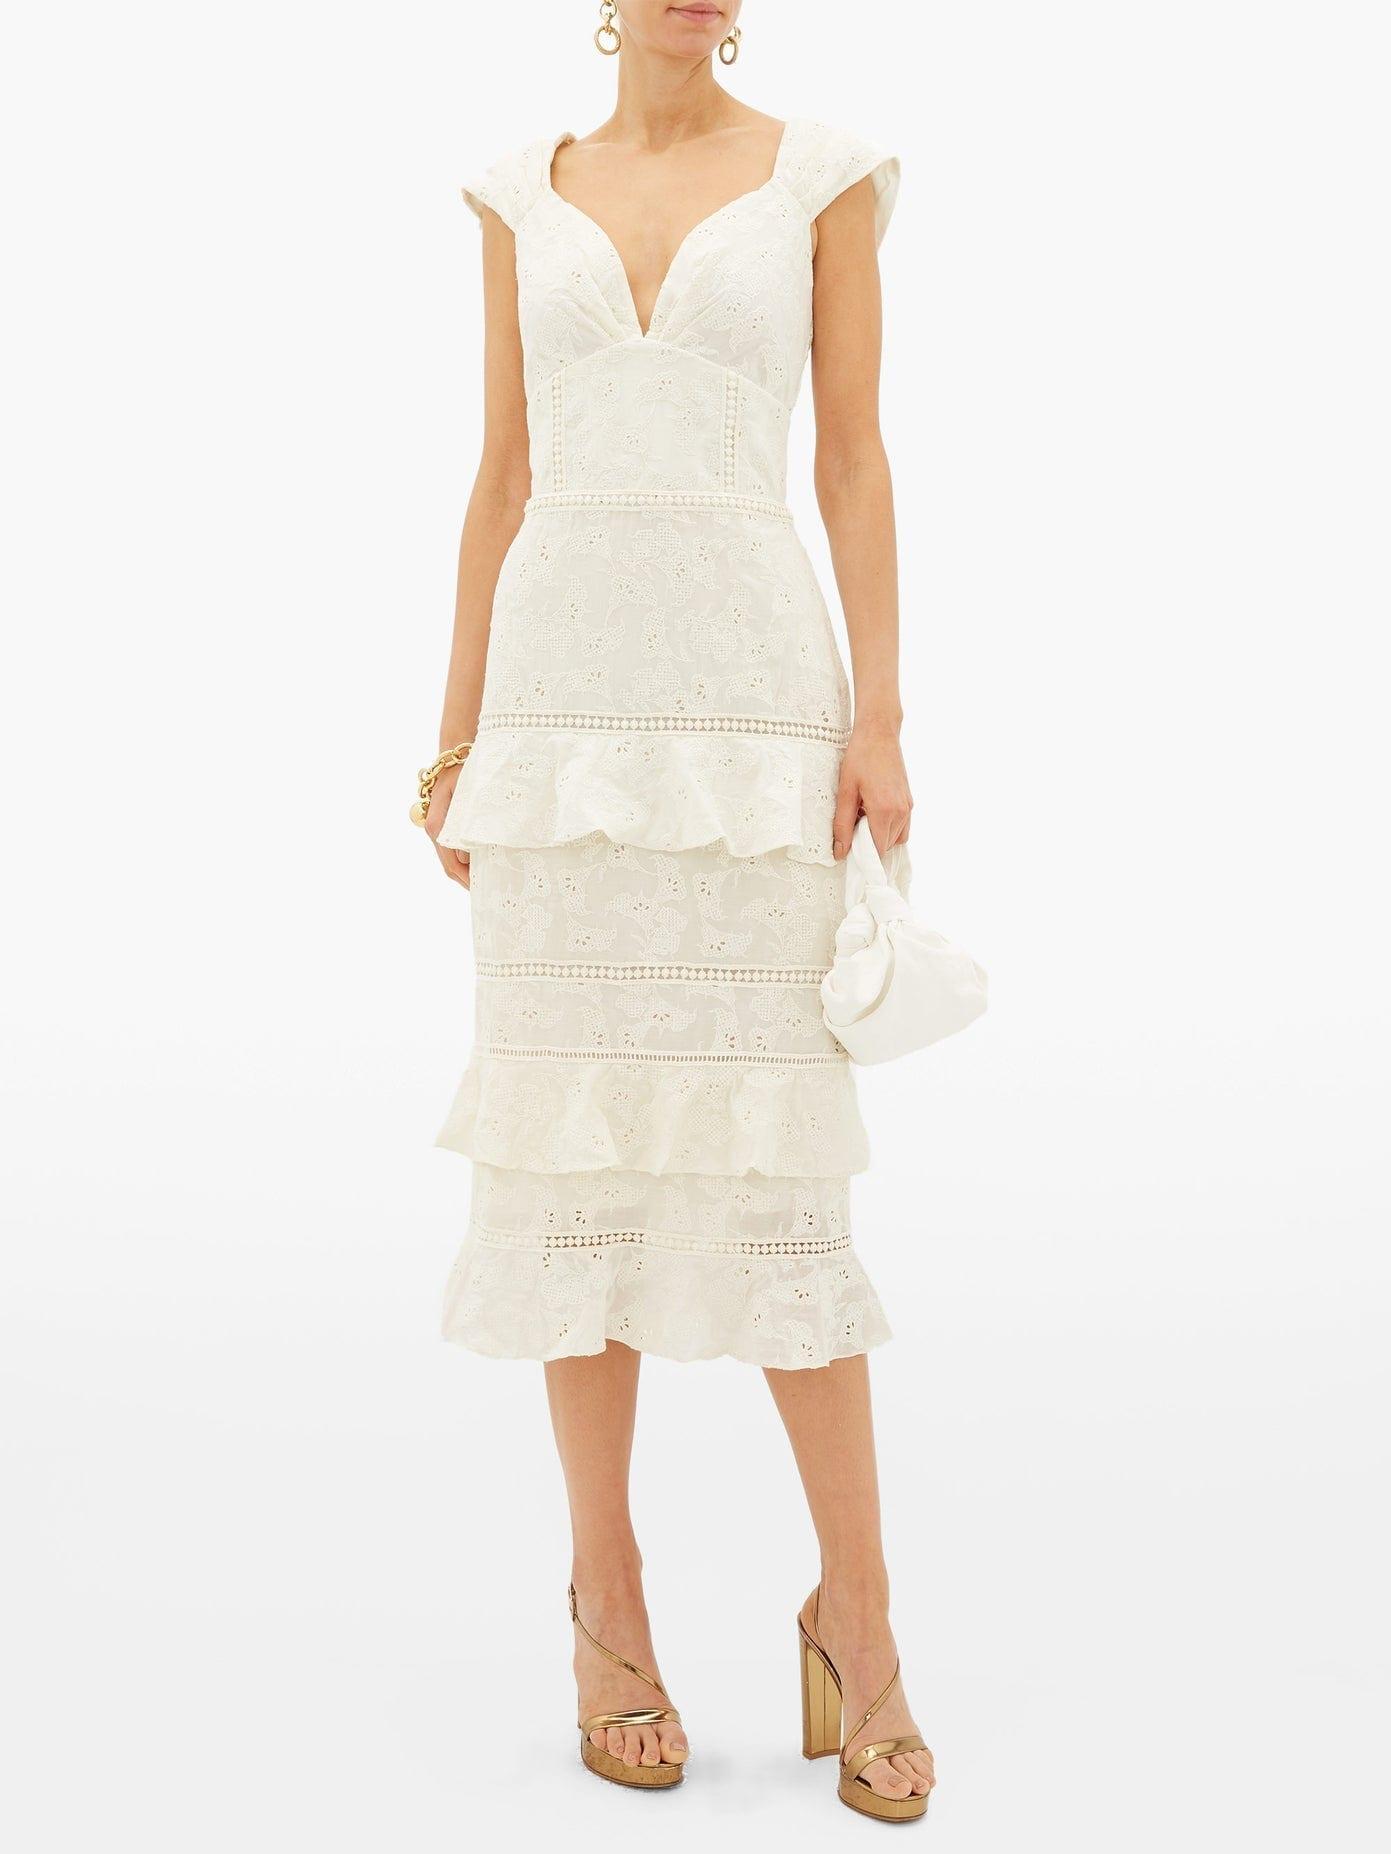 JOHANNA ORTIZ Traduce Me Embroidered Cotton-Voile Dress